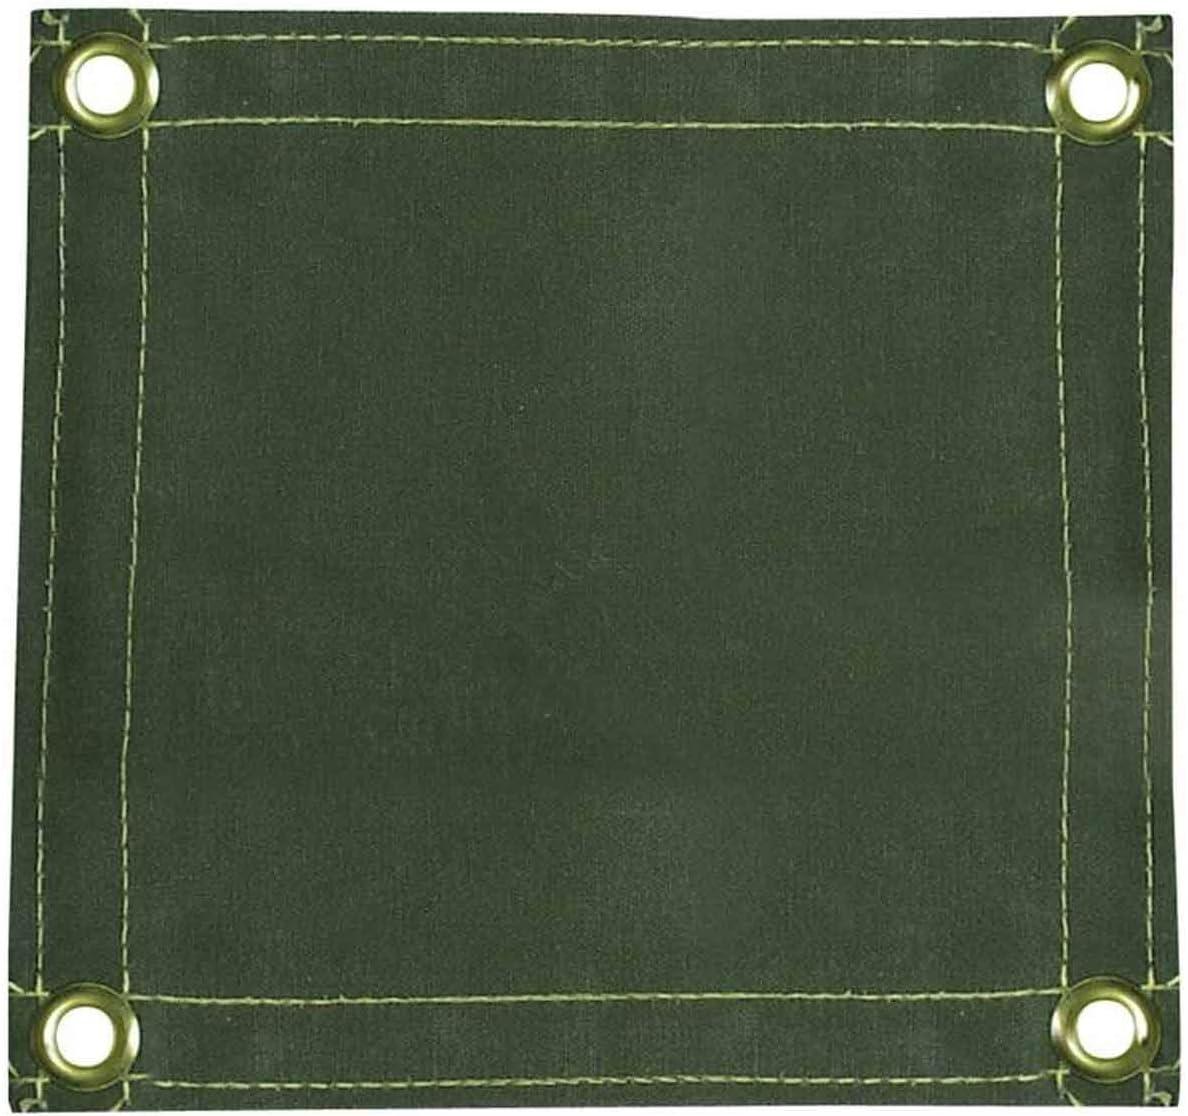 Tillman 583R610 6X10 12oz 1 Panel Olive Duck Replacement Welding Cu